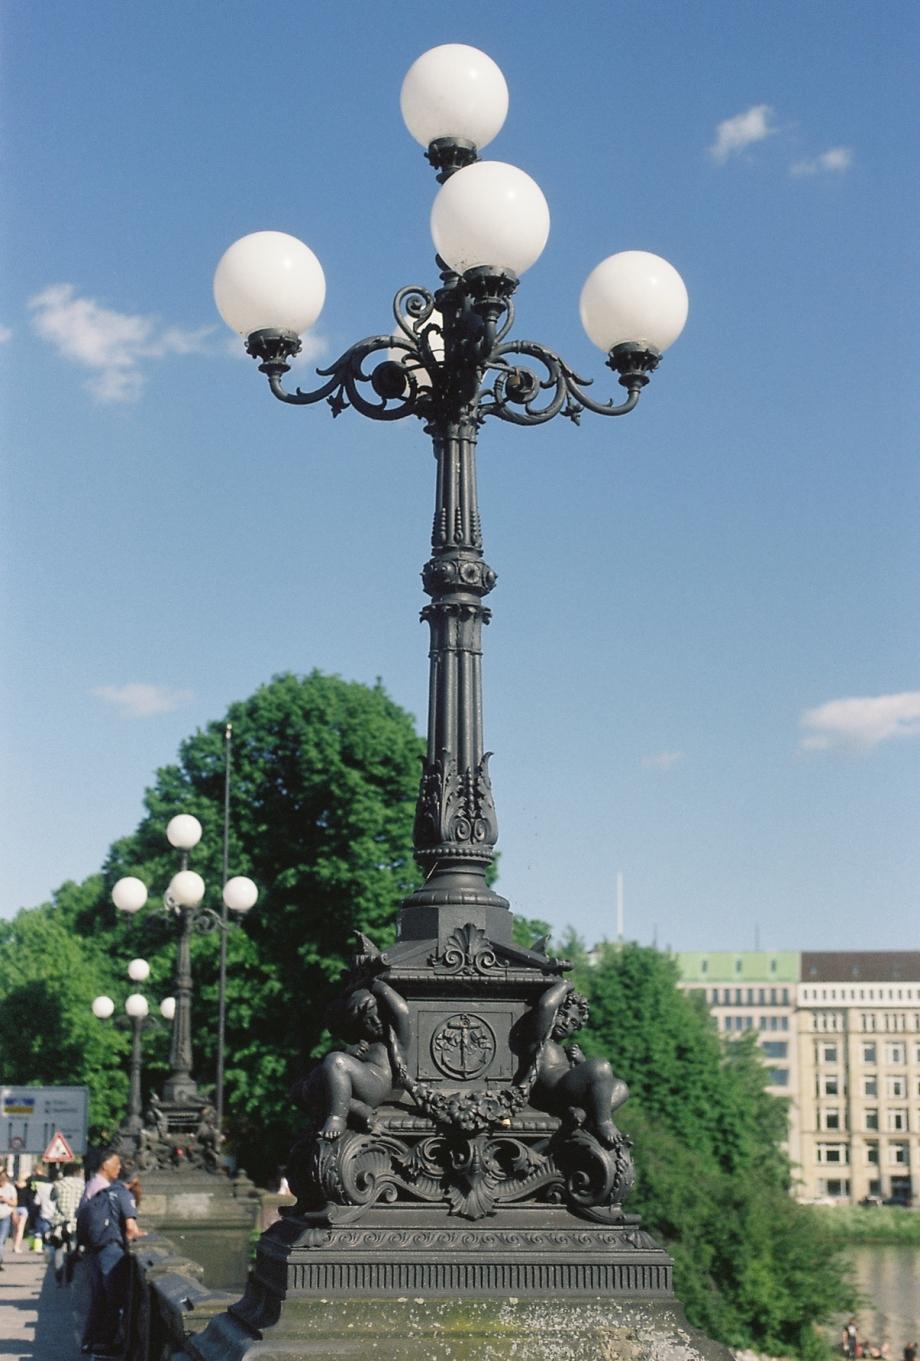 Street Light On Lombardsbrücke in Hamburg. Shot on 35mm Film.